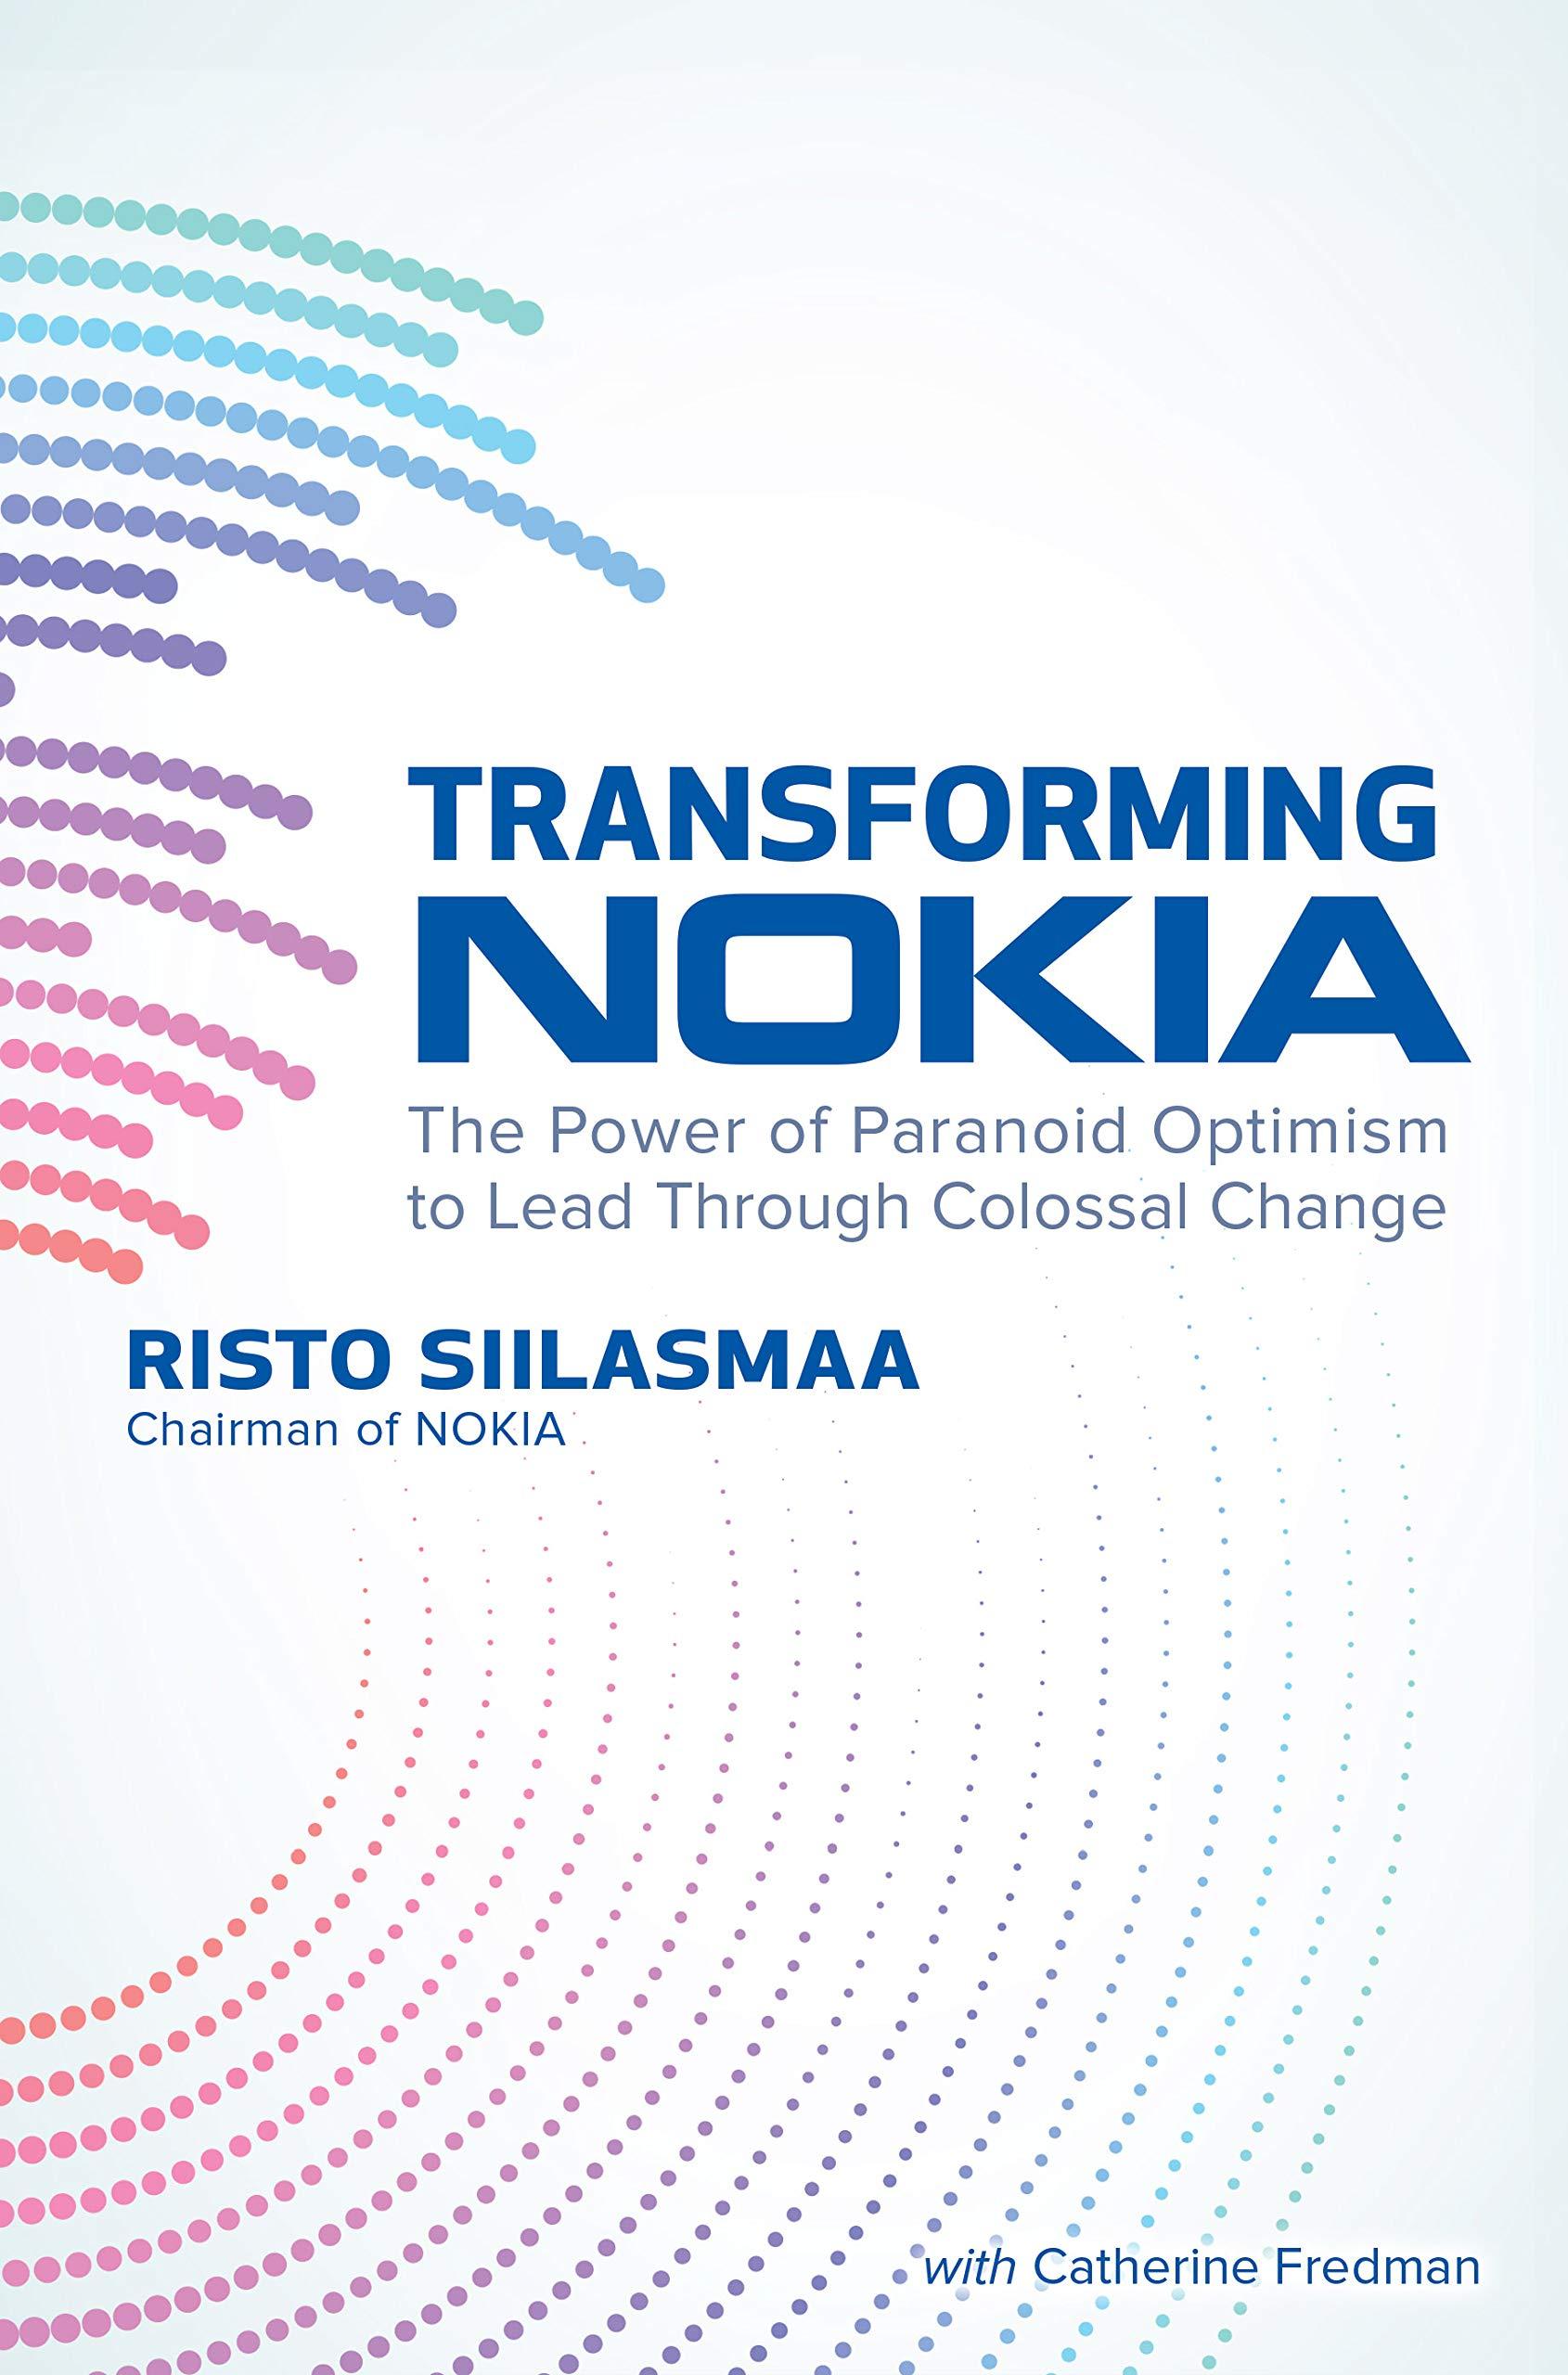 Amazon.com: Transforming NOKIA: The Power of Paranoid Optimism to ...